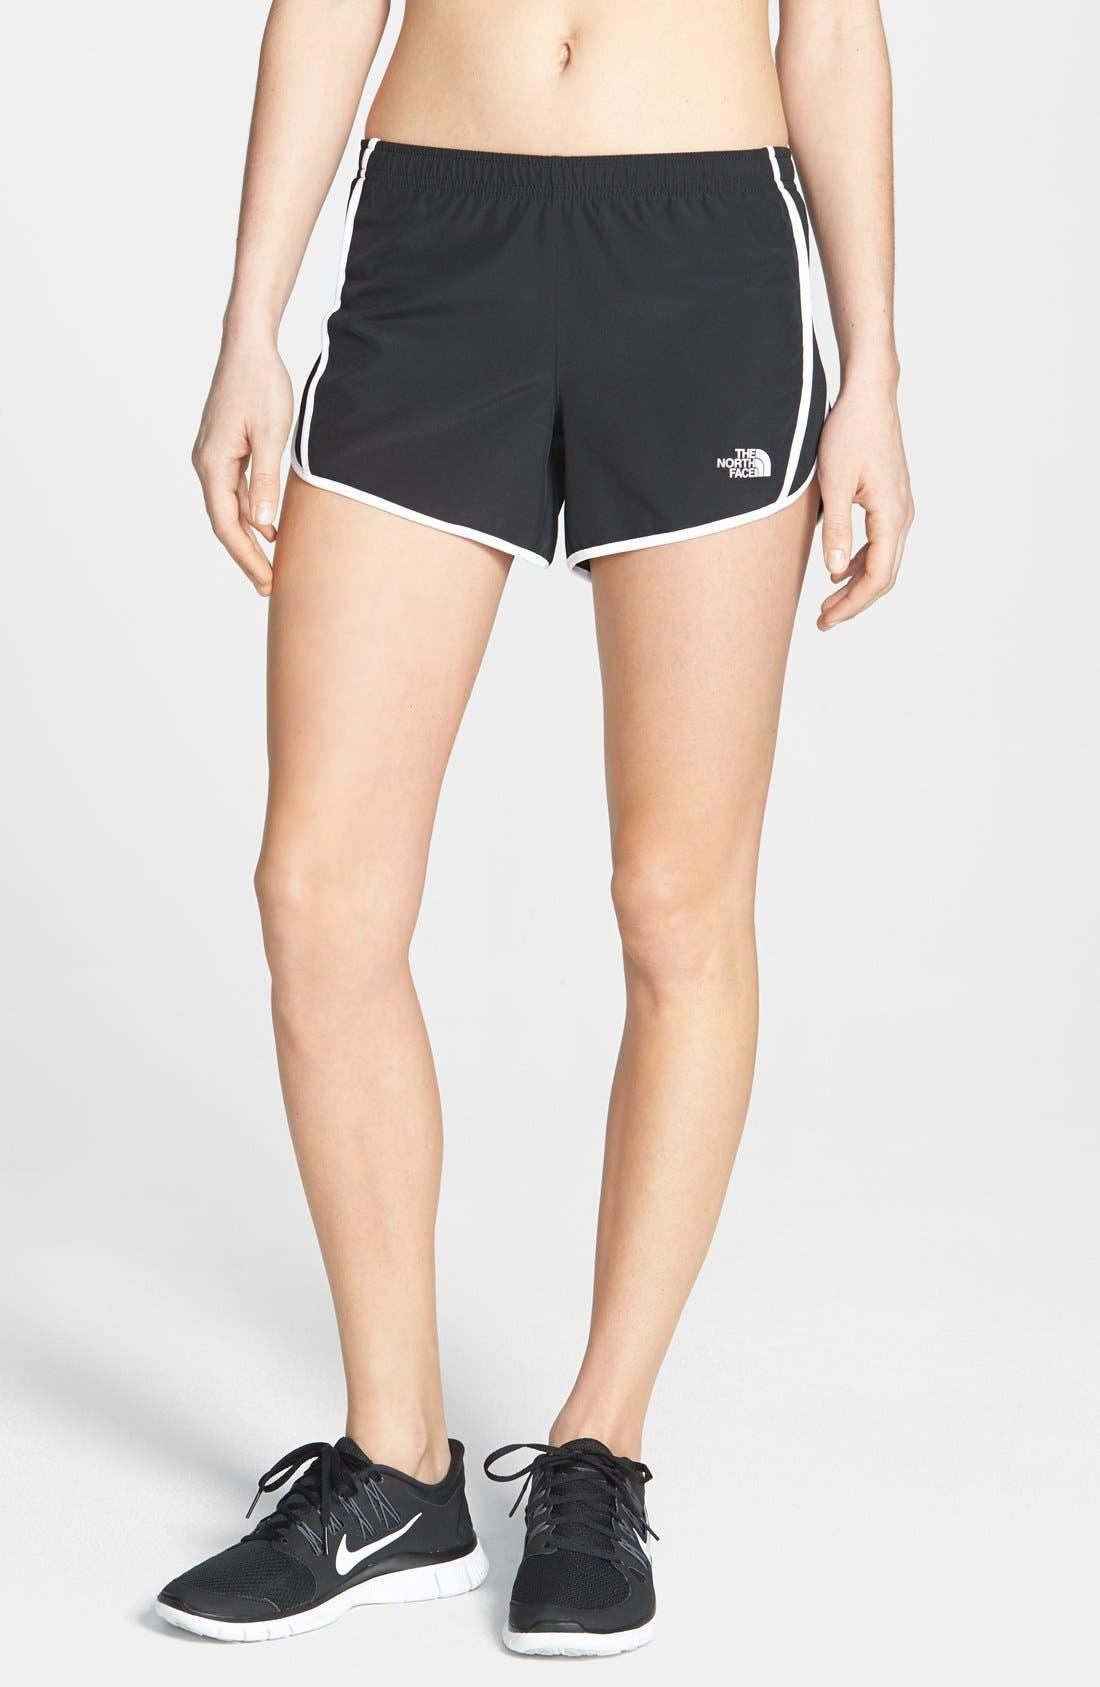 Main Image - The North Face 'GTD' Running Shorts